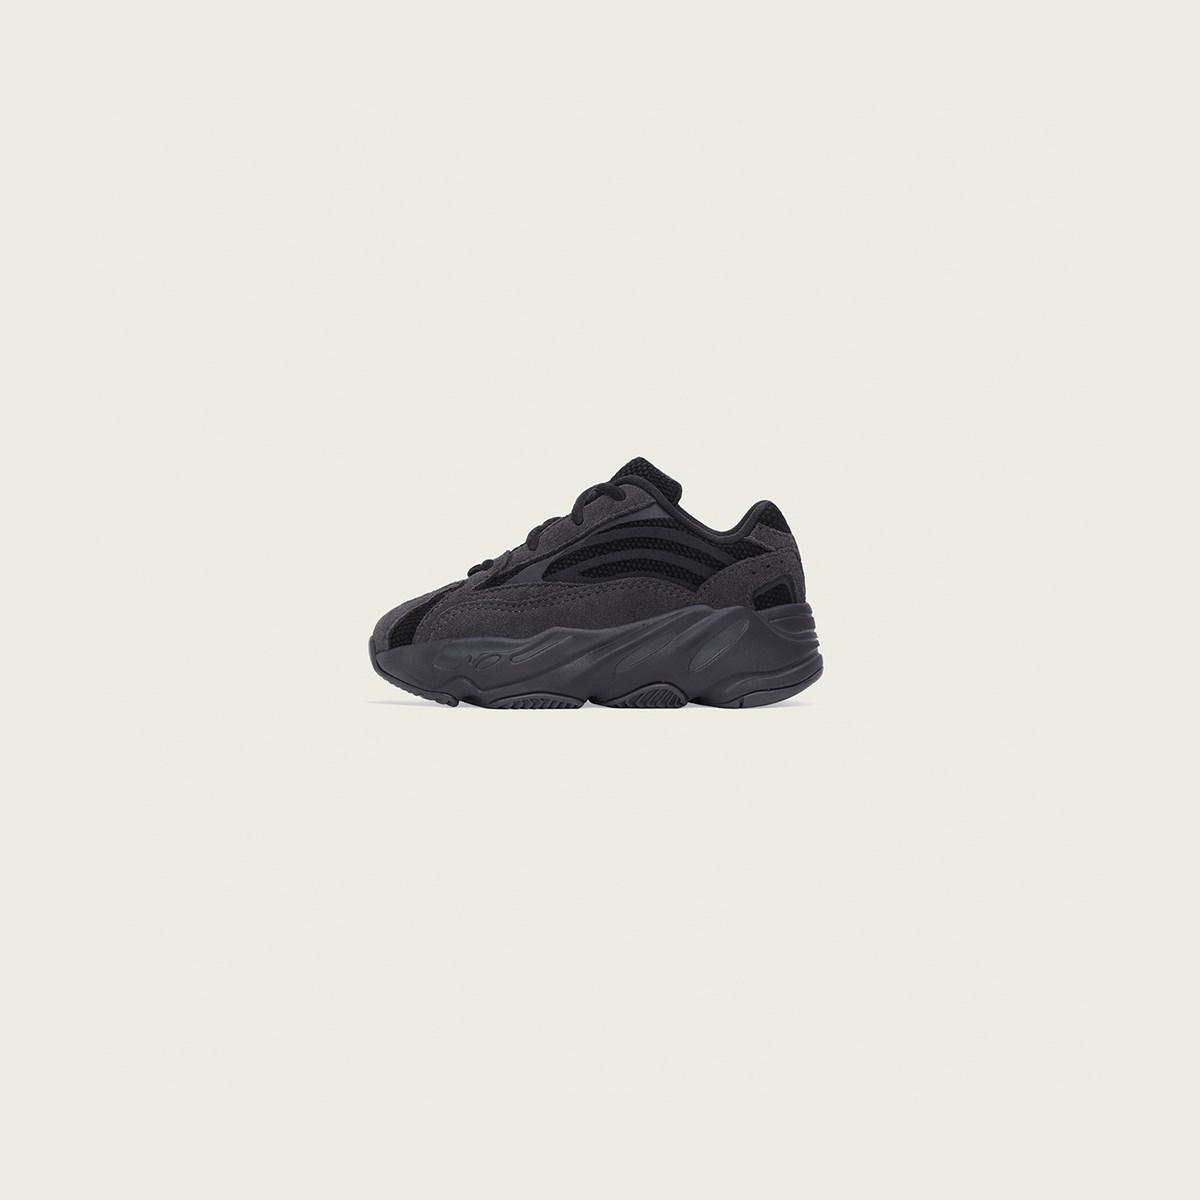 adidas Yeezy Boost 700 V2 Infant